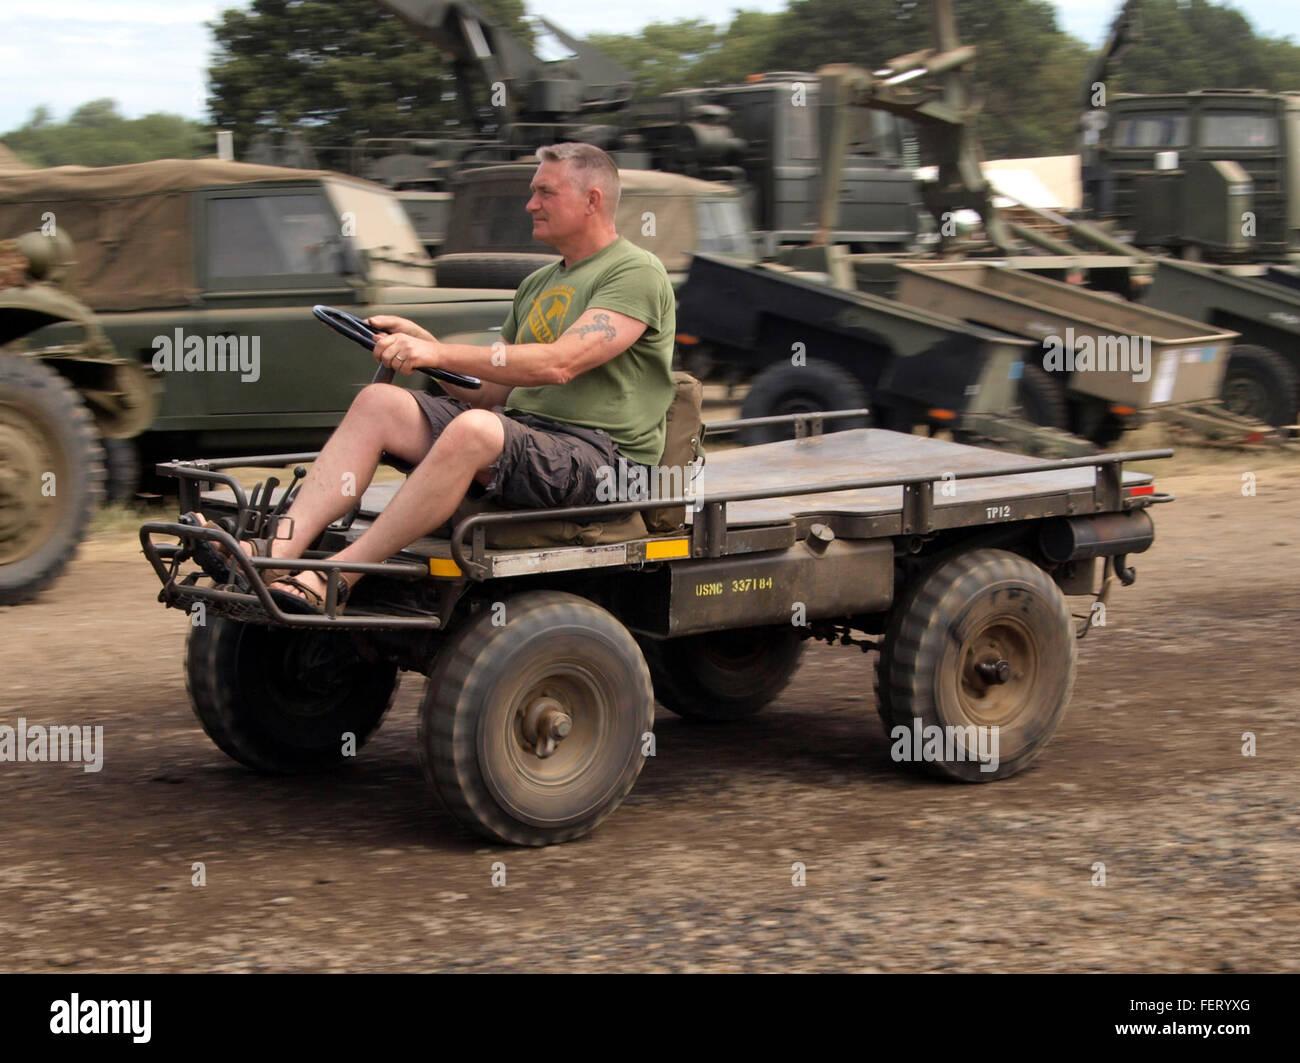 G-400 4x4 M274-A5 Mule USMC 337184 Mechanical Mule pic1 - Stock Image